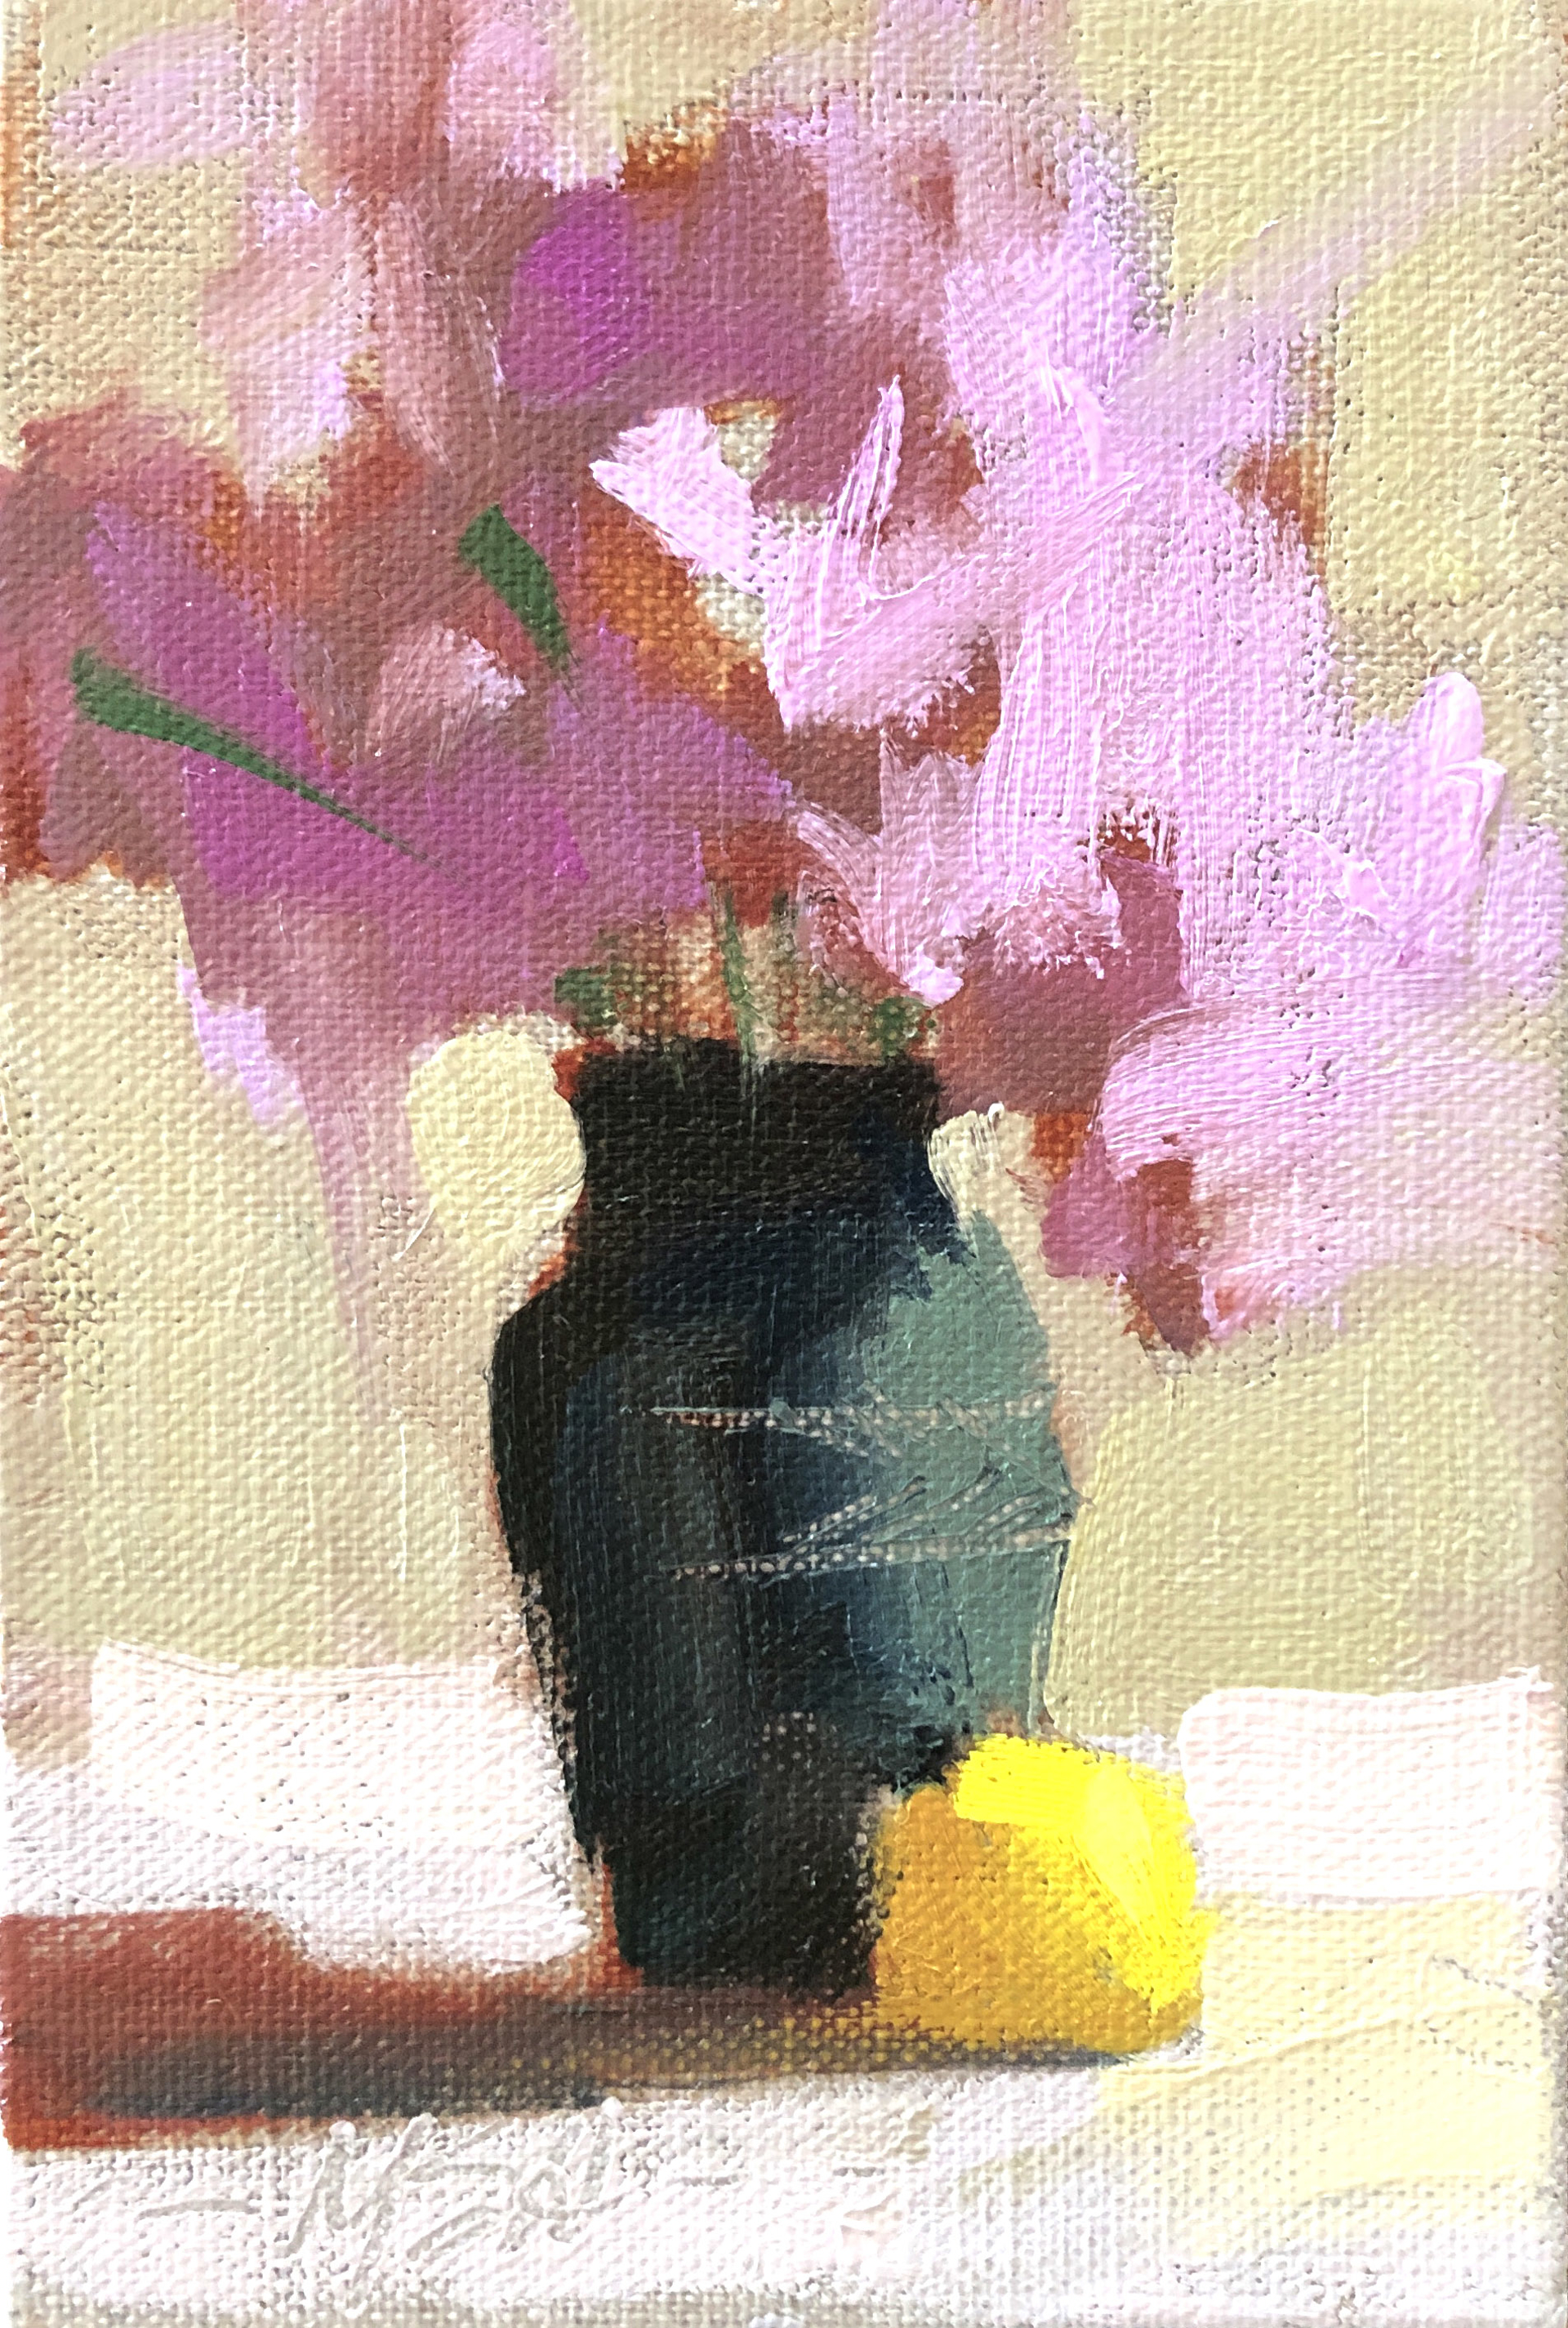 Simpatico by Marjorie Hicks